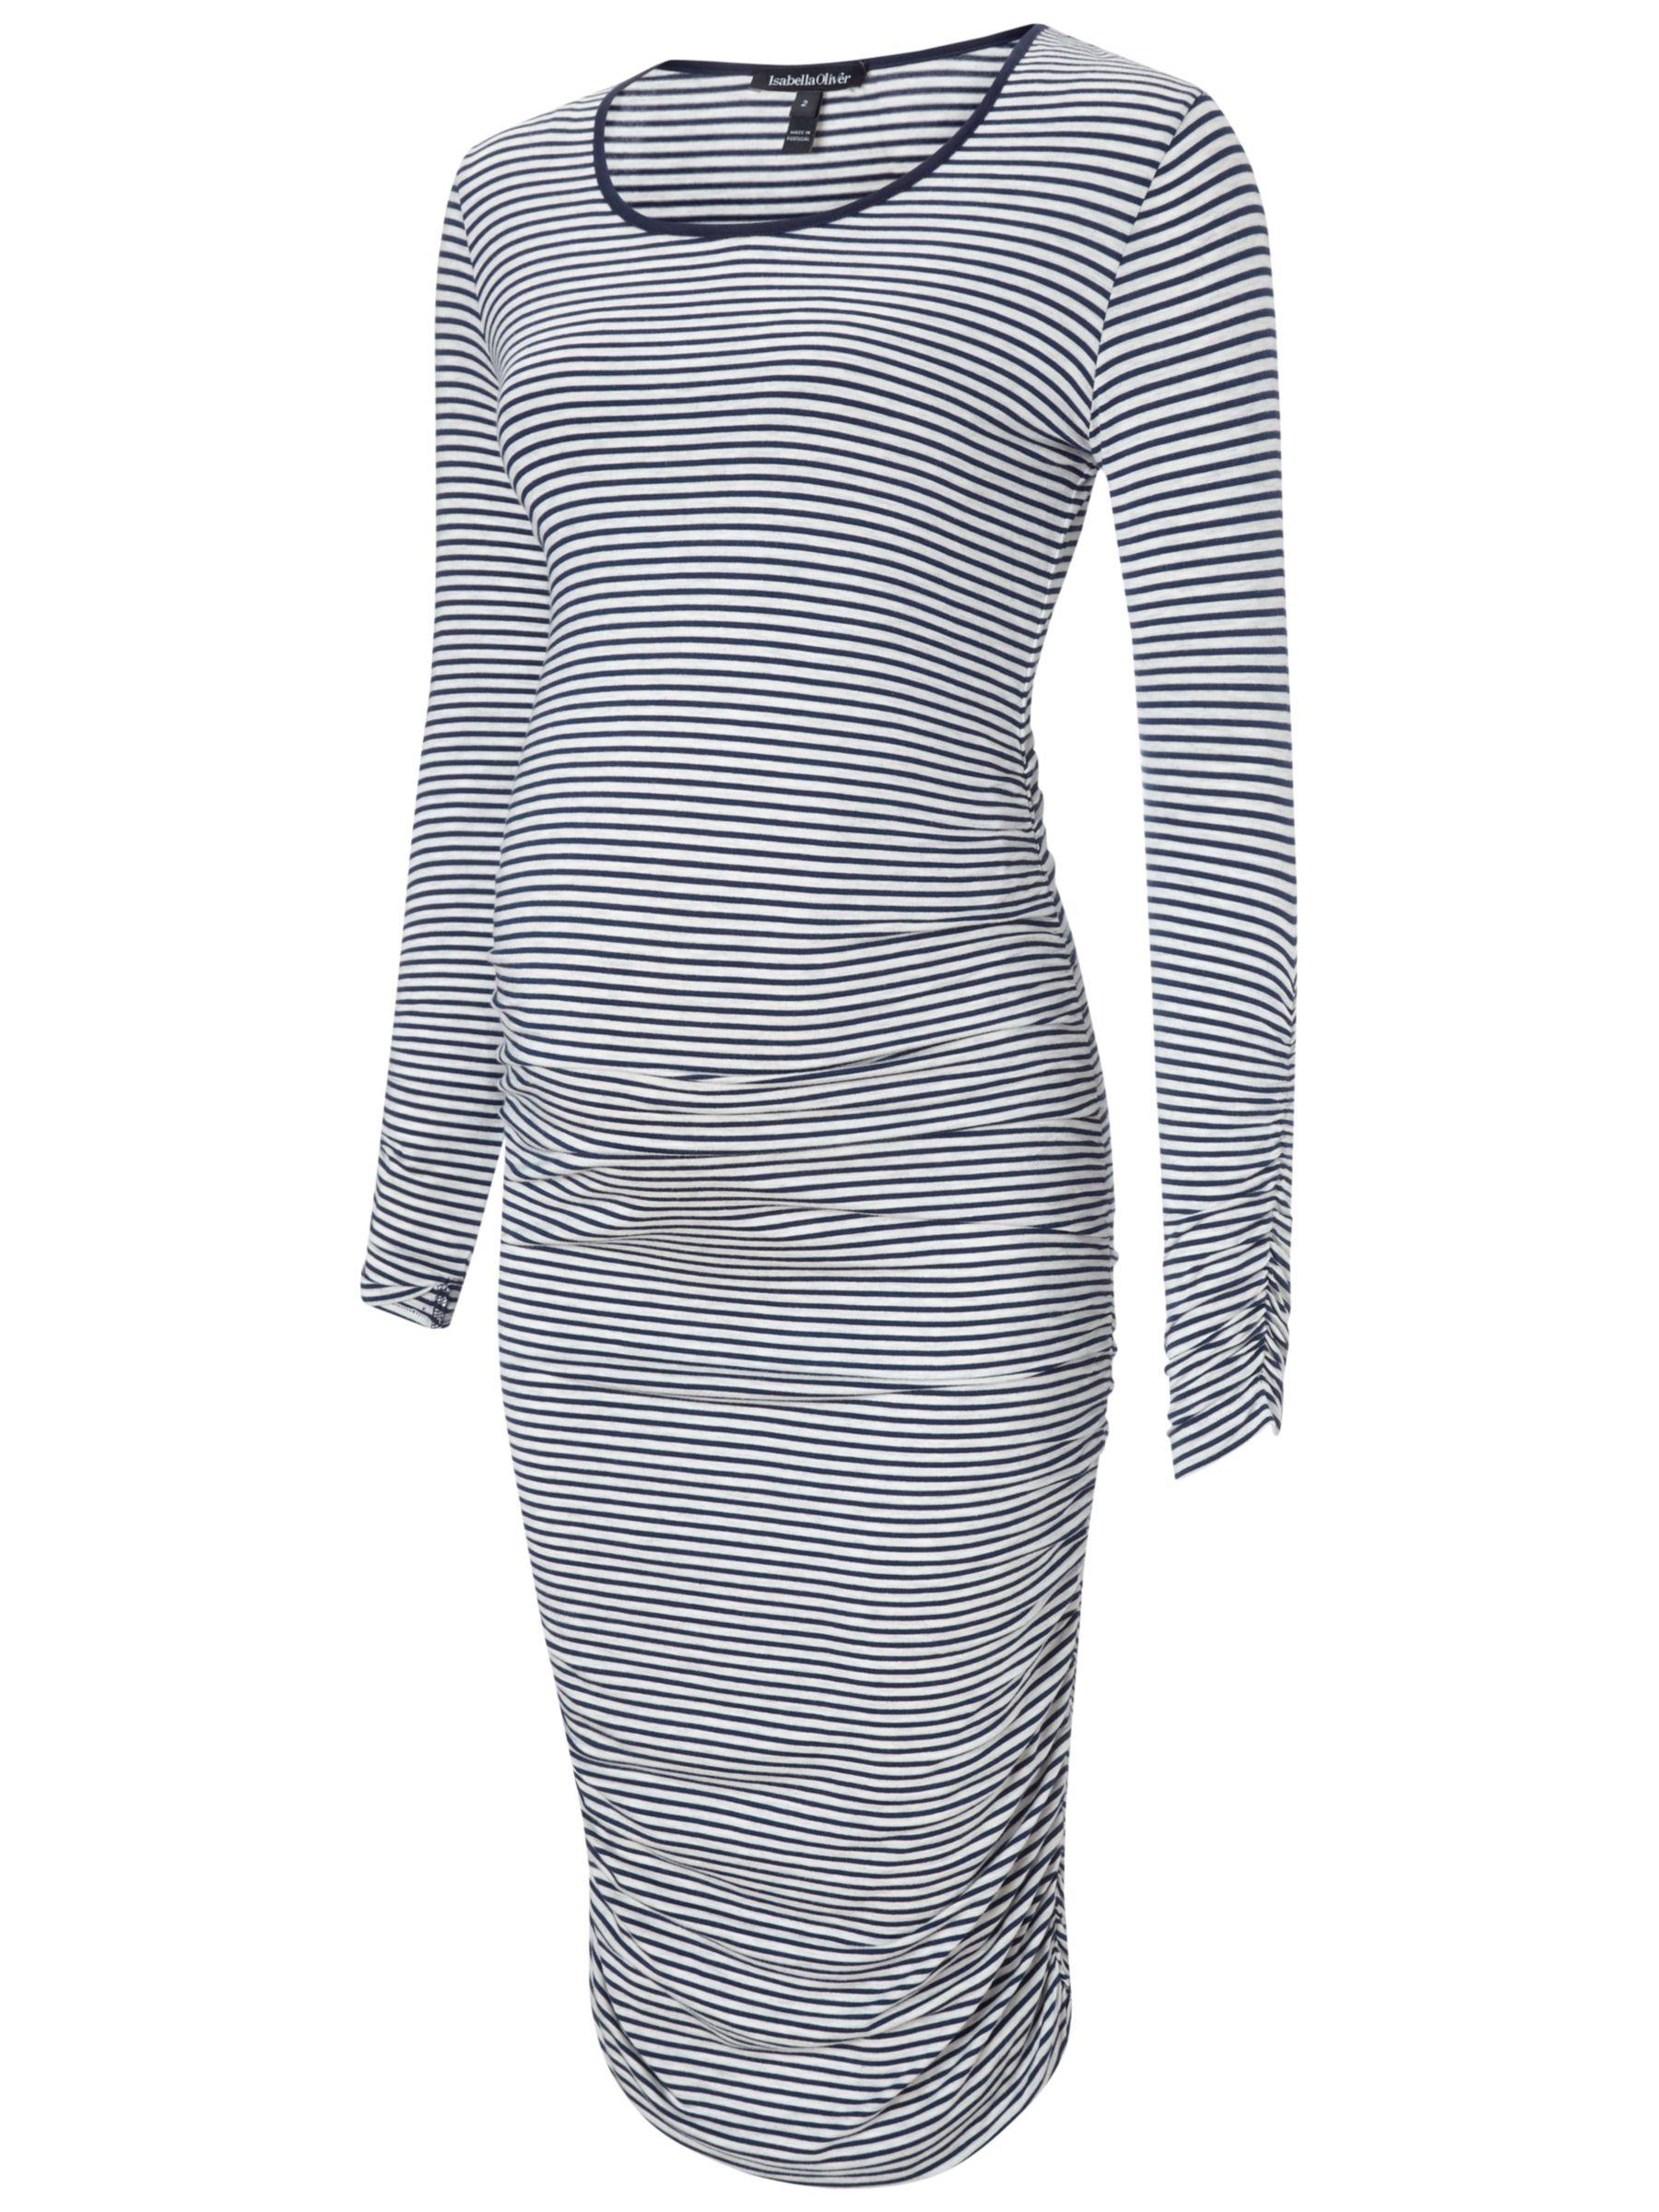 Isabella Oliver Isabella Oliver Betty Stripe Maternity Dress, Navy/White